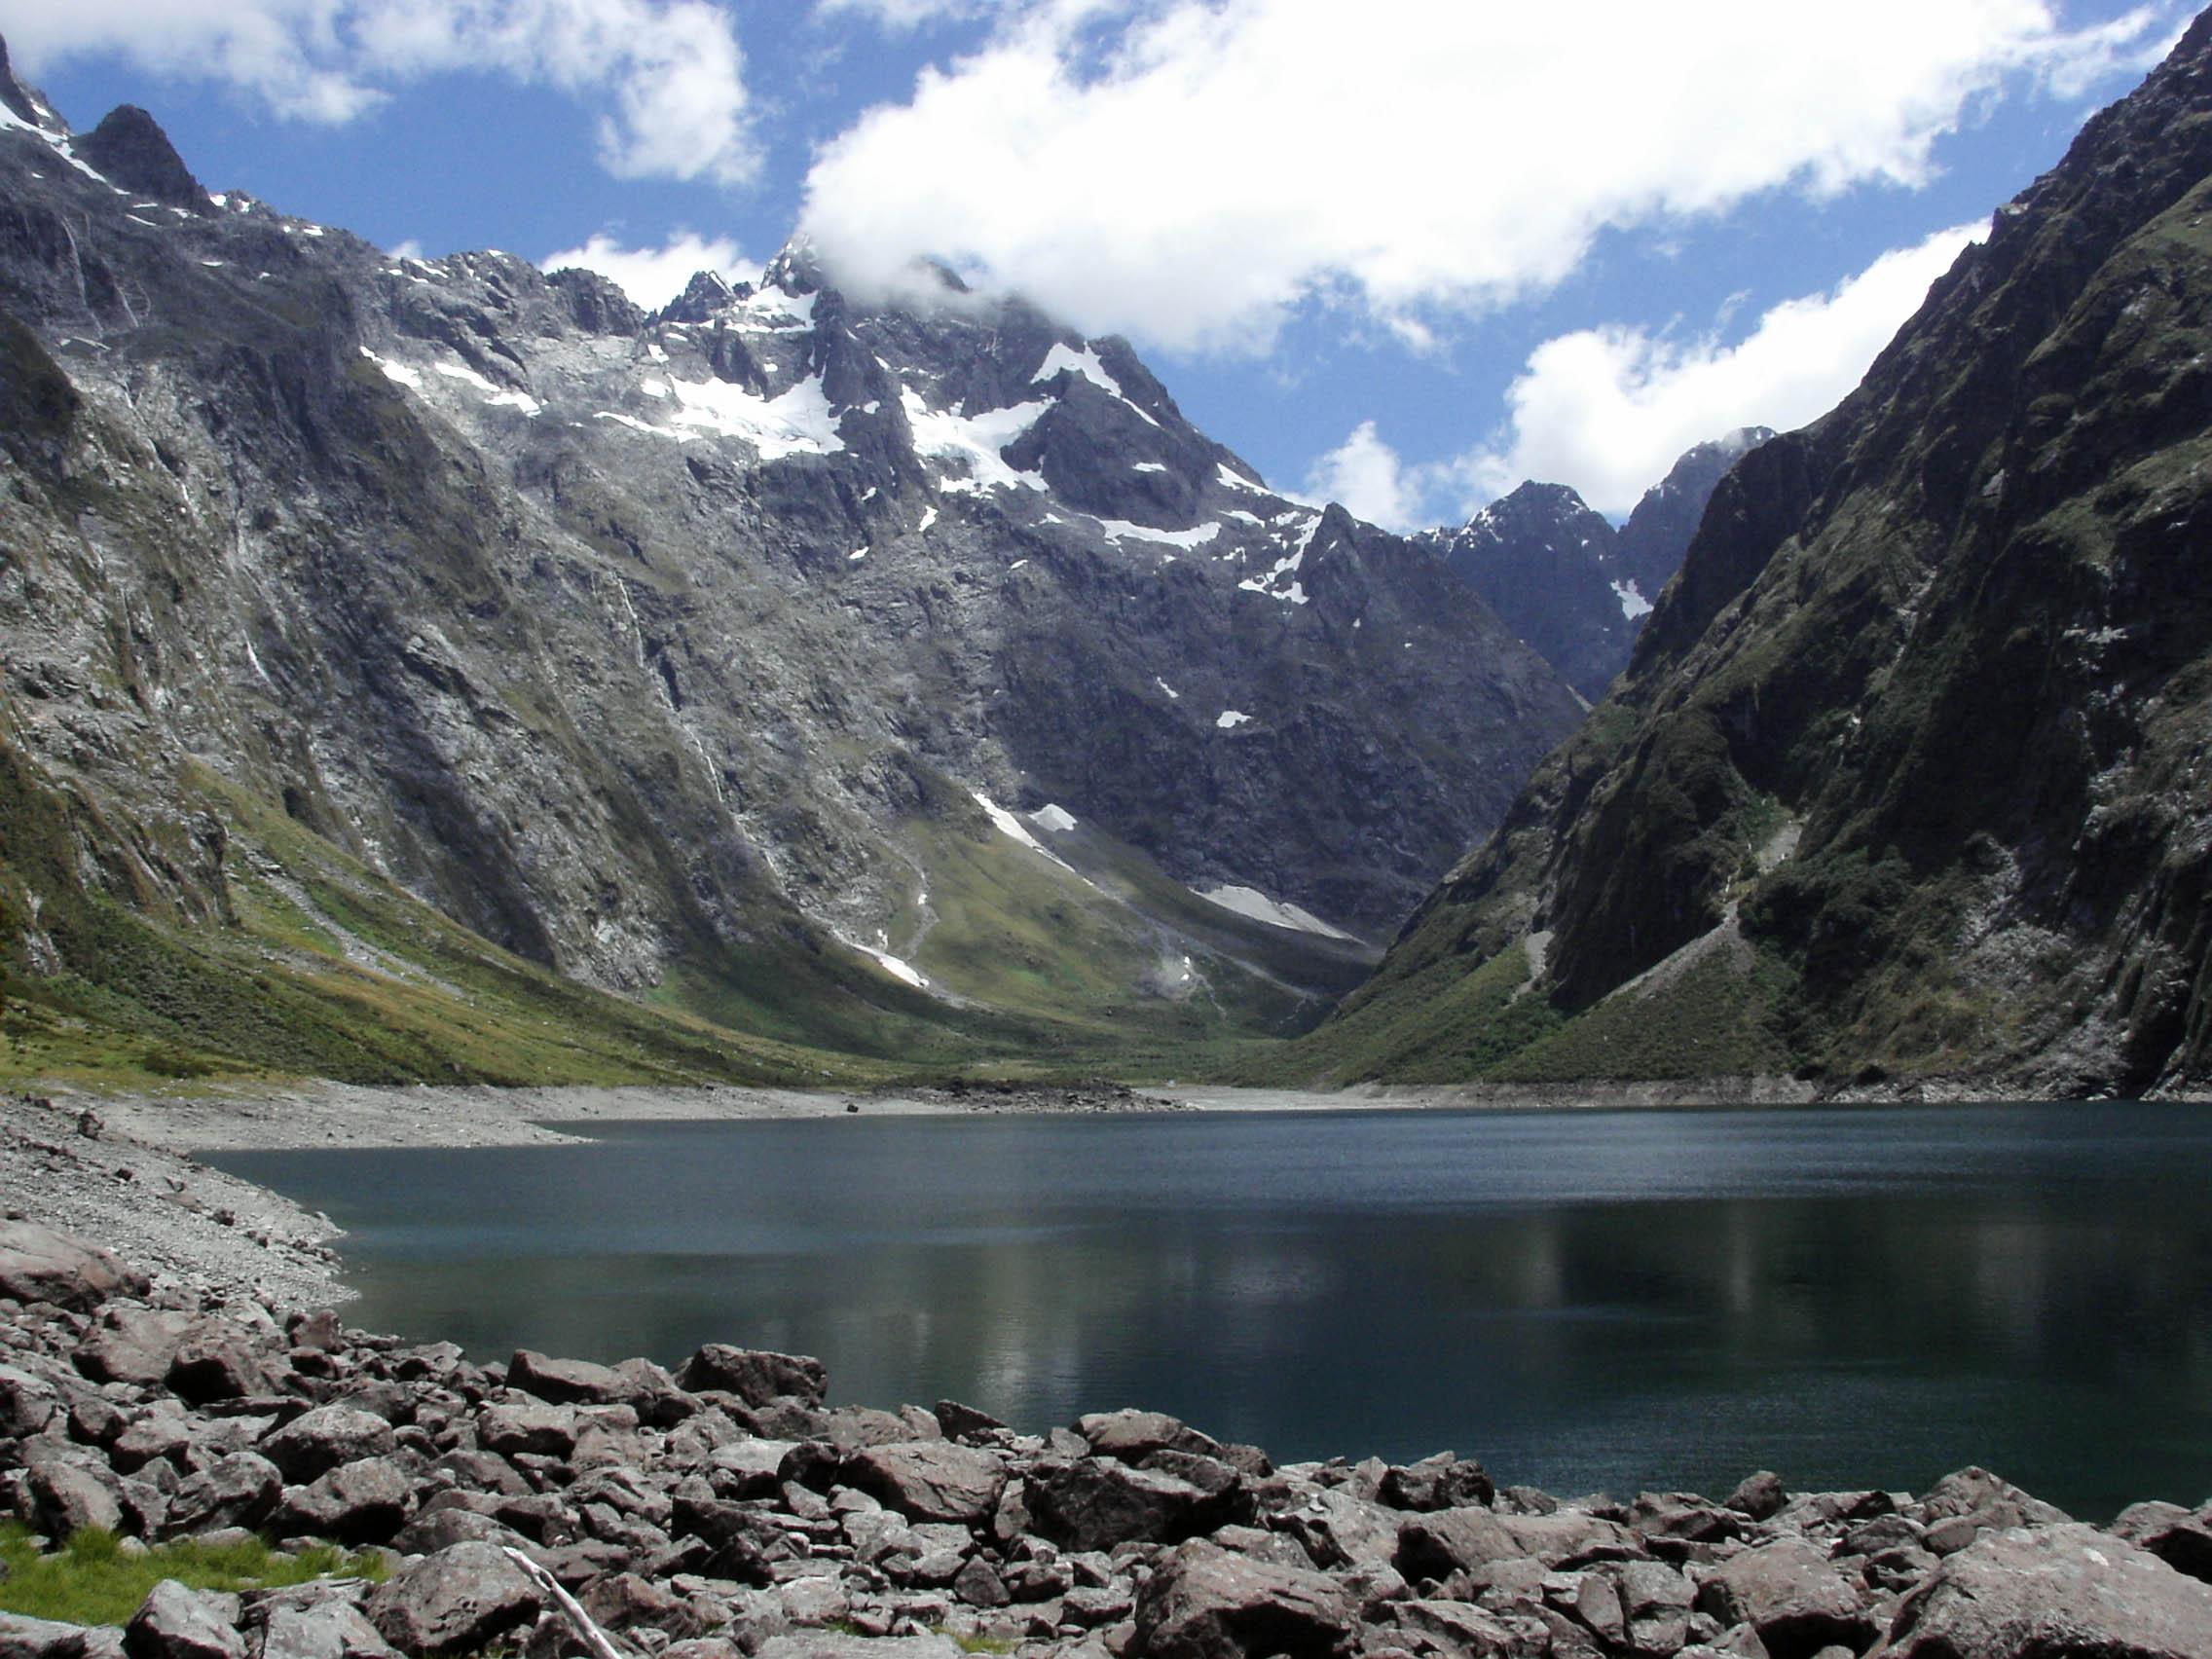 Fiordland_Lake_Marian-1.jpg